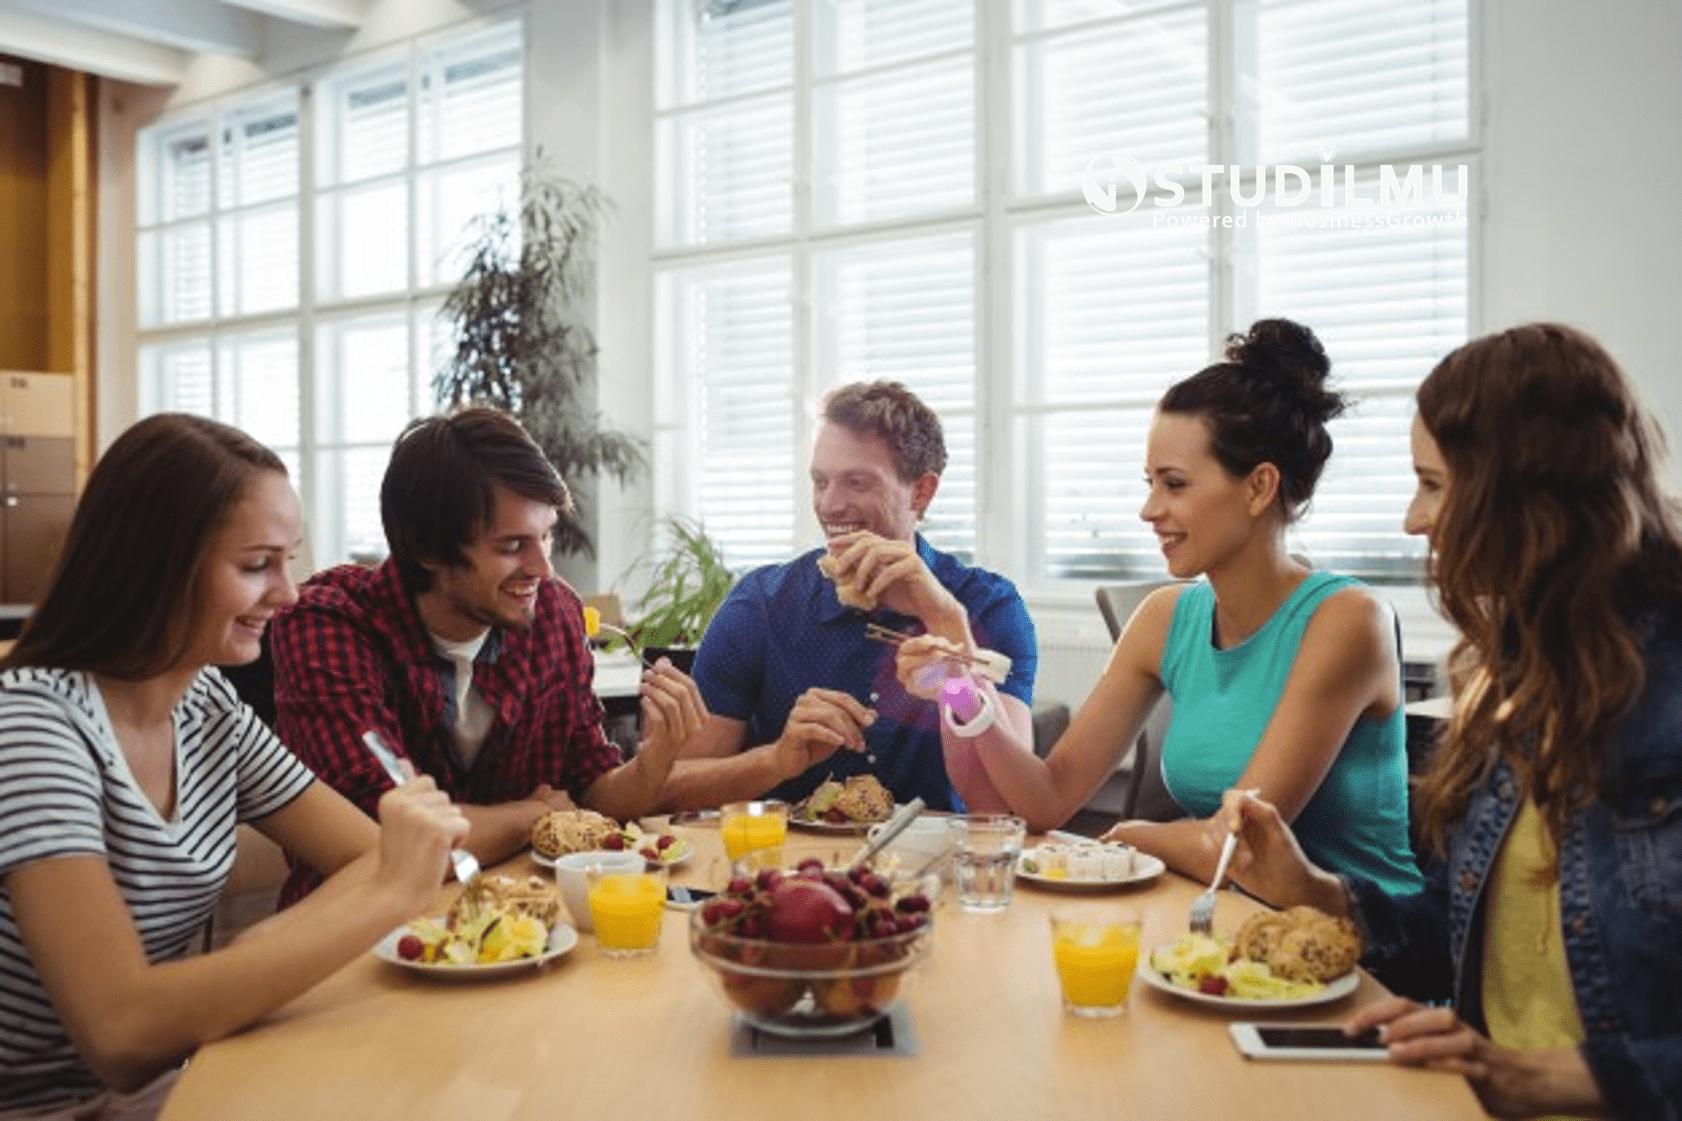 STUDILMU Career Advice - 5 Cara Memanfaatkan Waktu Makan Siang